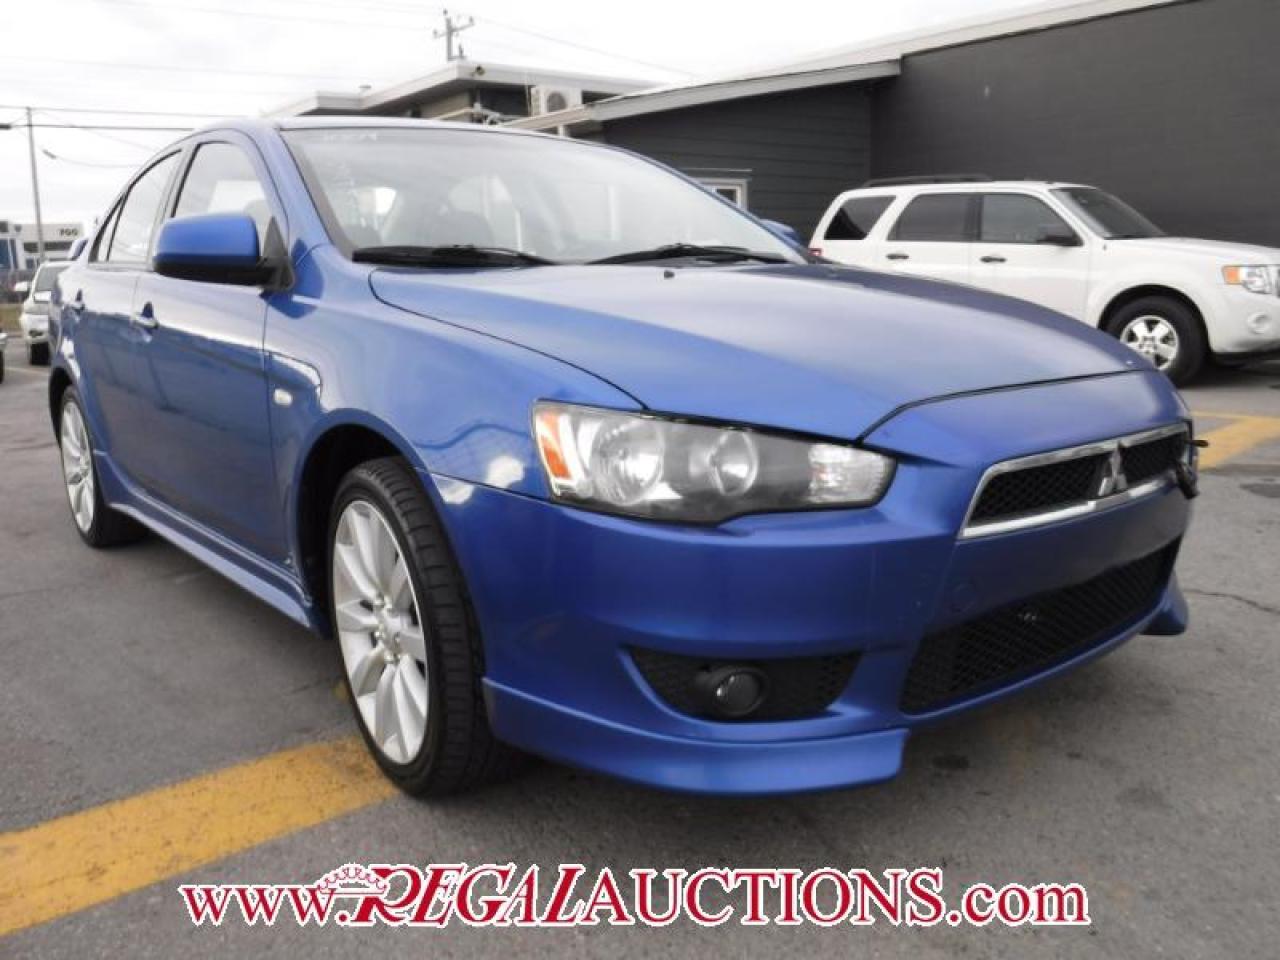 Photo of Blue 2009 Mitsubishi LANCER GTS 4D SEDAN